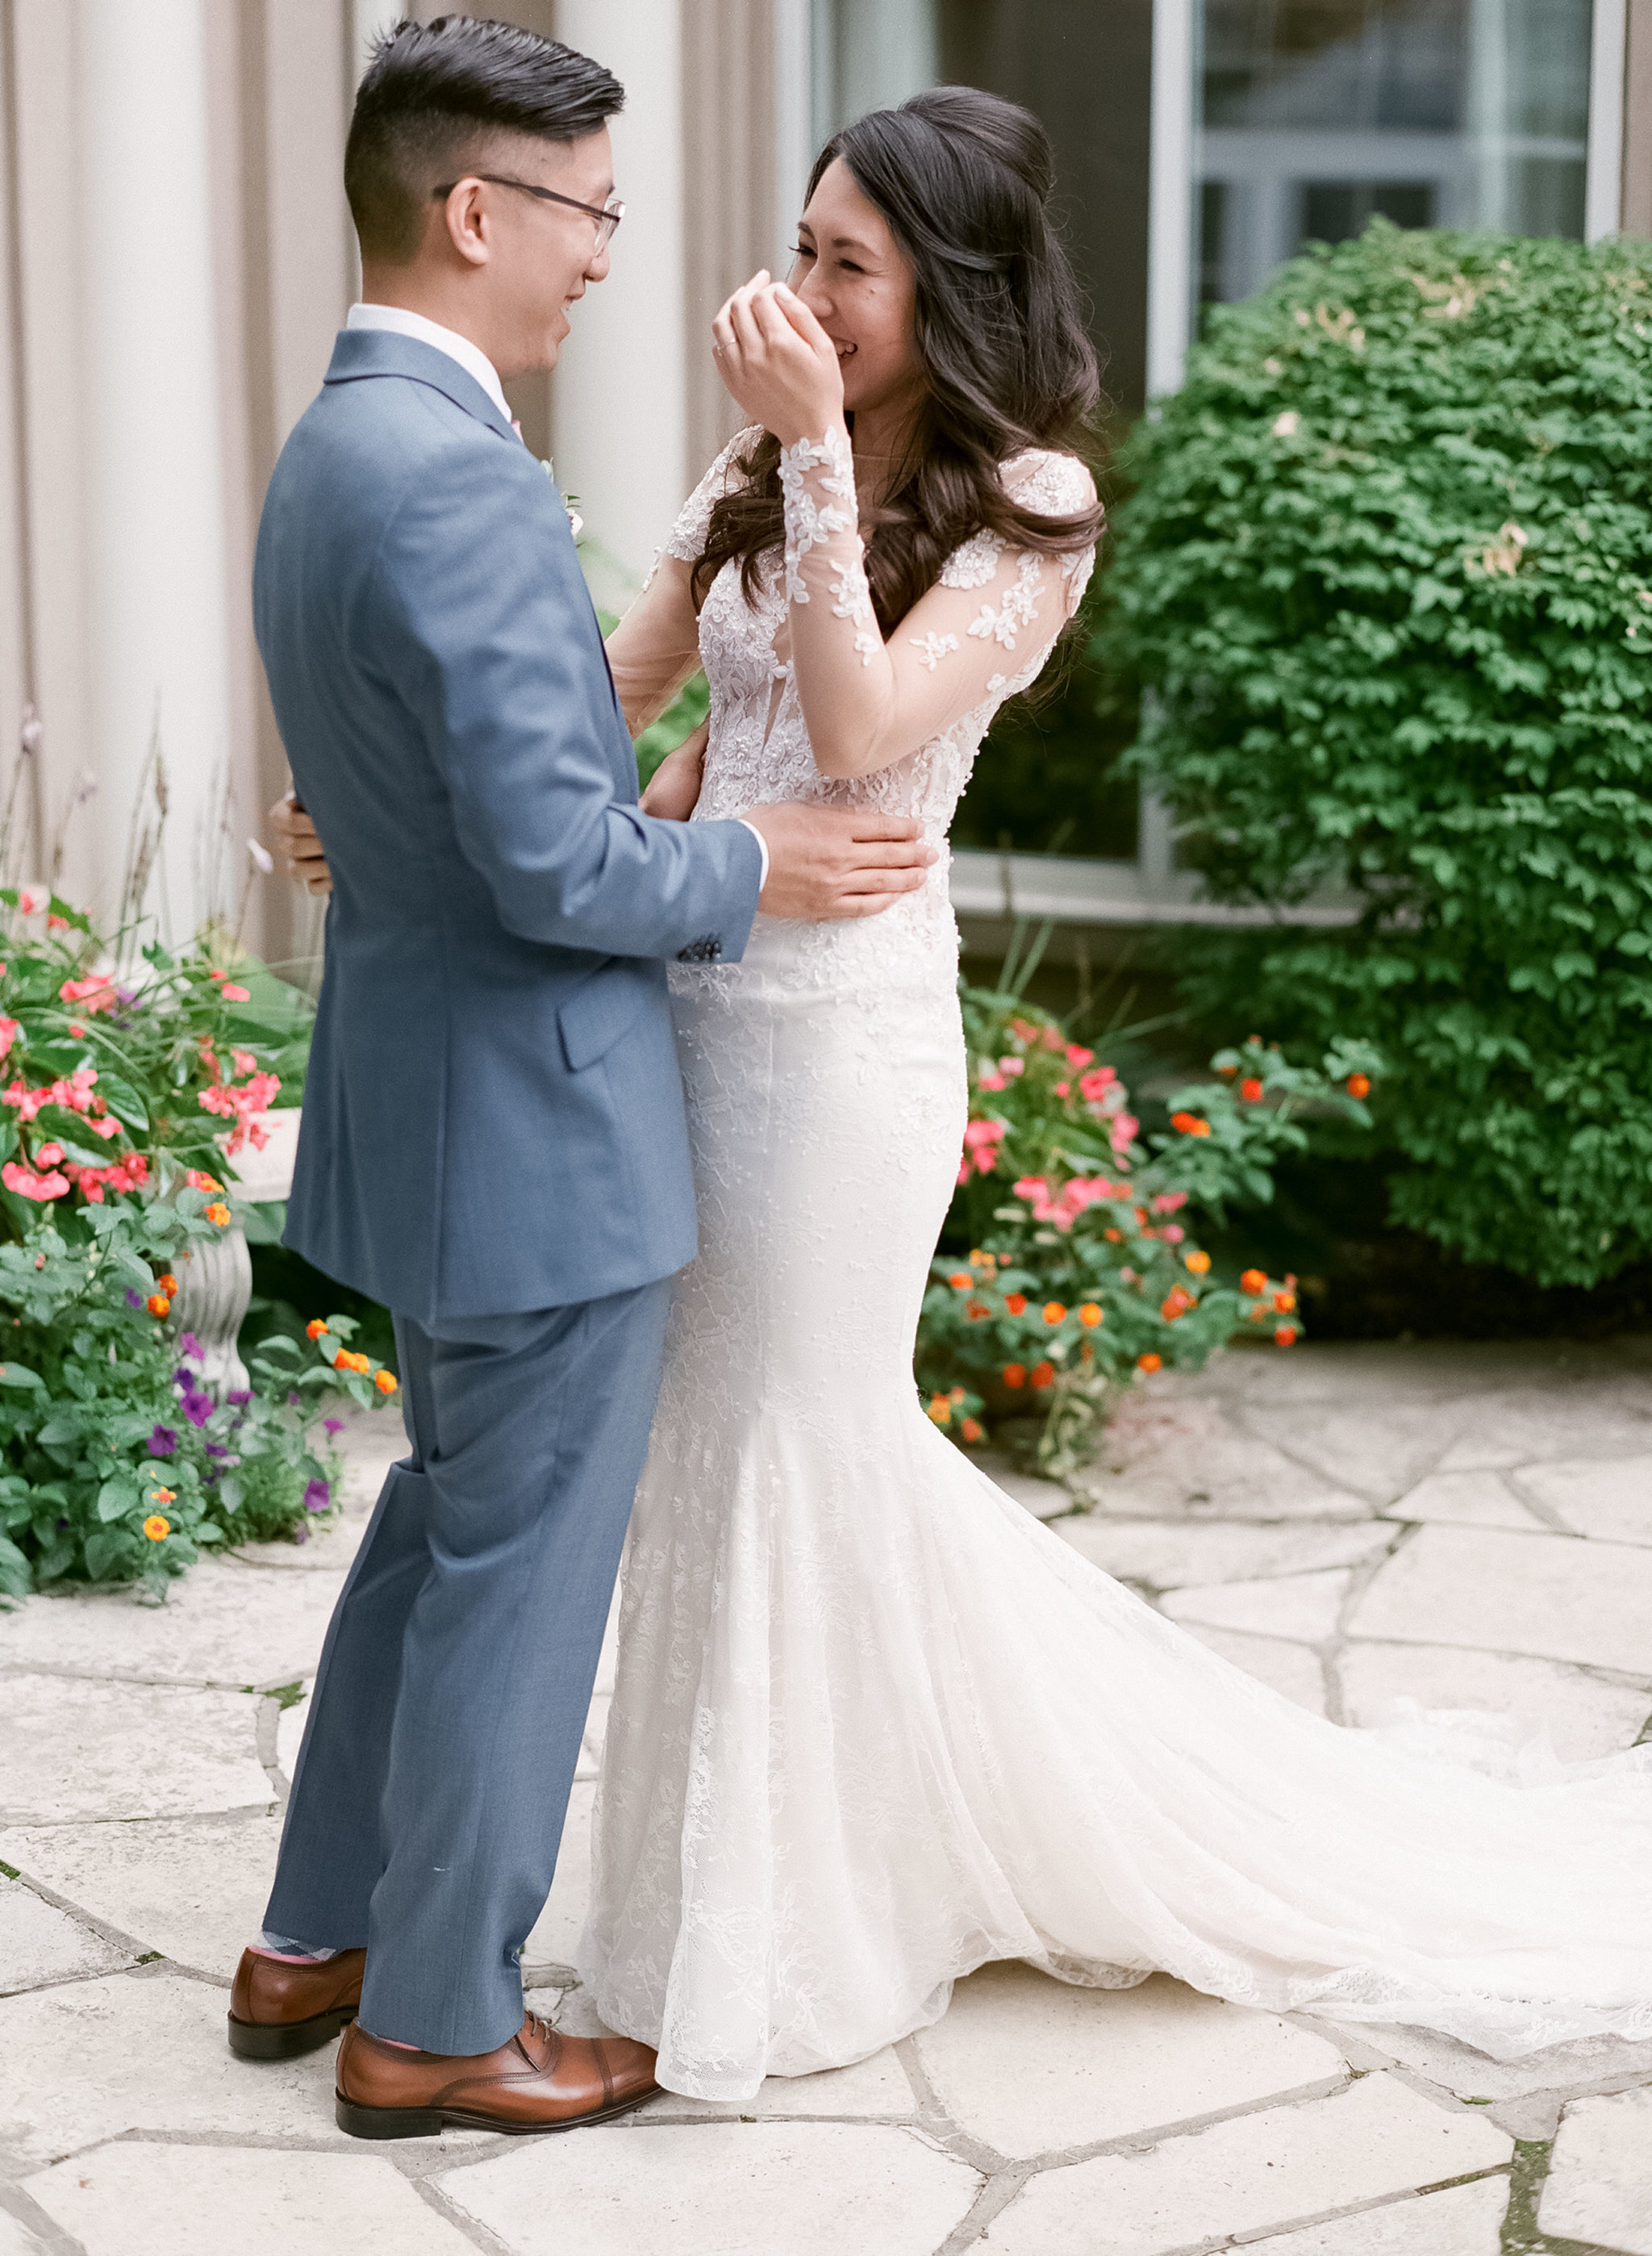 0160-artiese-chateau-des-charmes-wedding-sonia-tim-000095220014.jpg